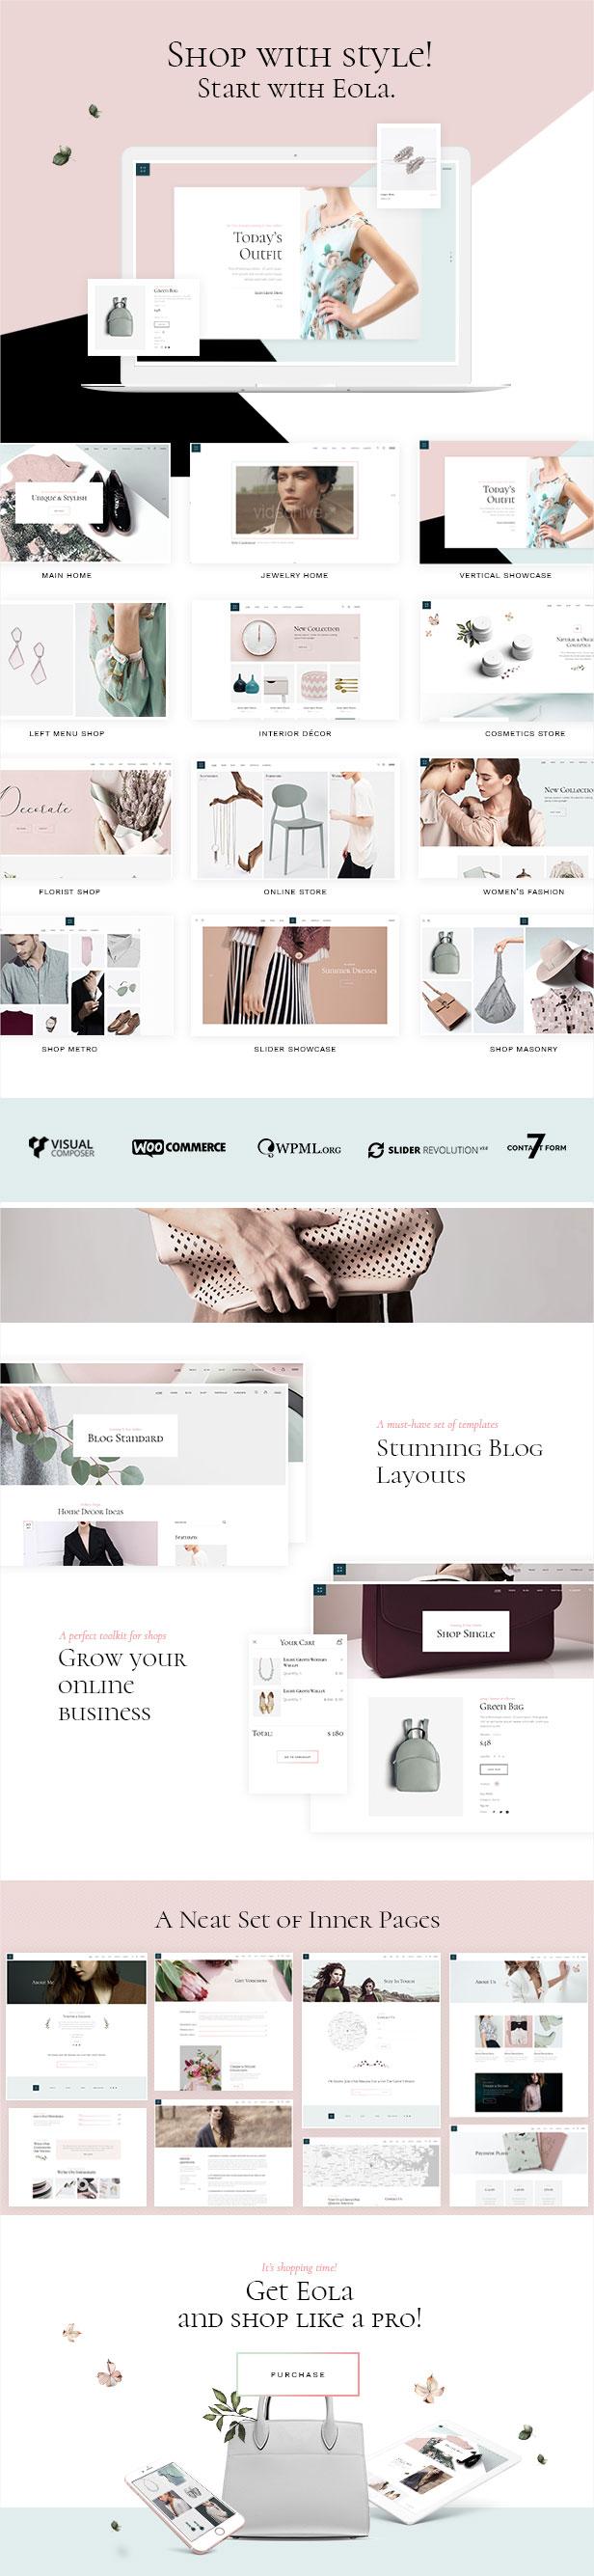 WordPress theme Eola - An Elegant, Multipurpose WooCommerce Theme (WooCommerce)